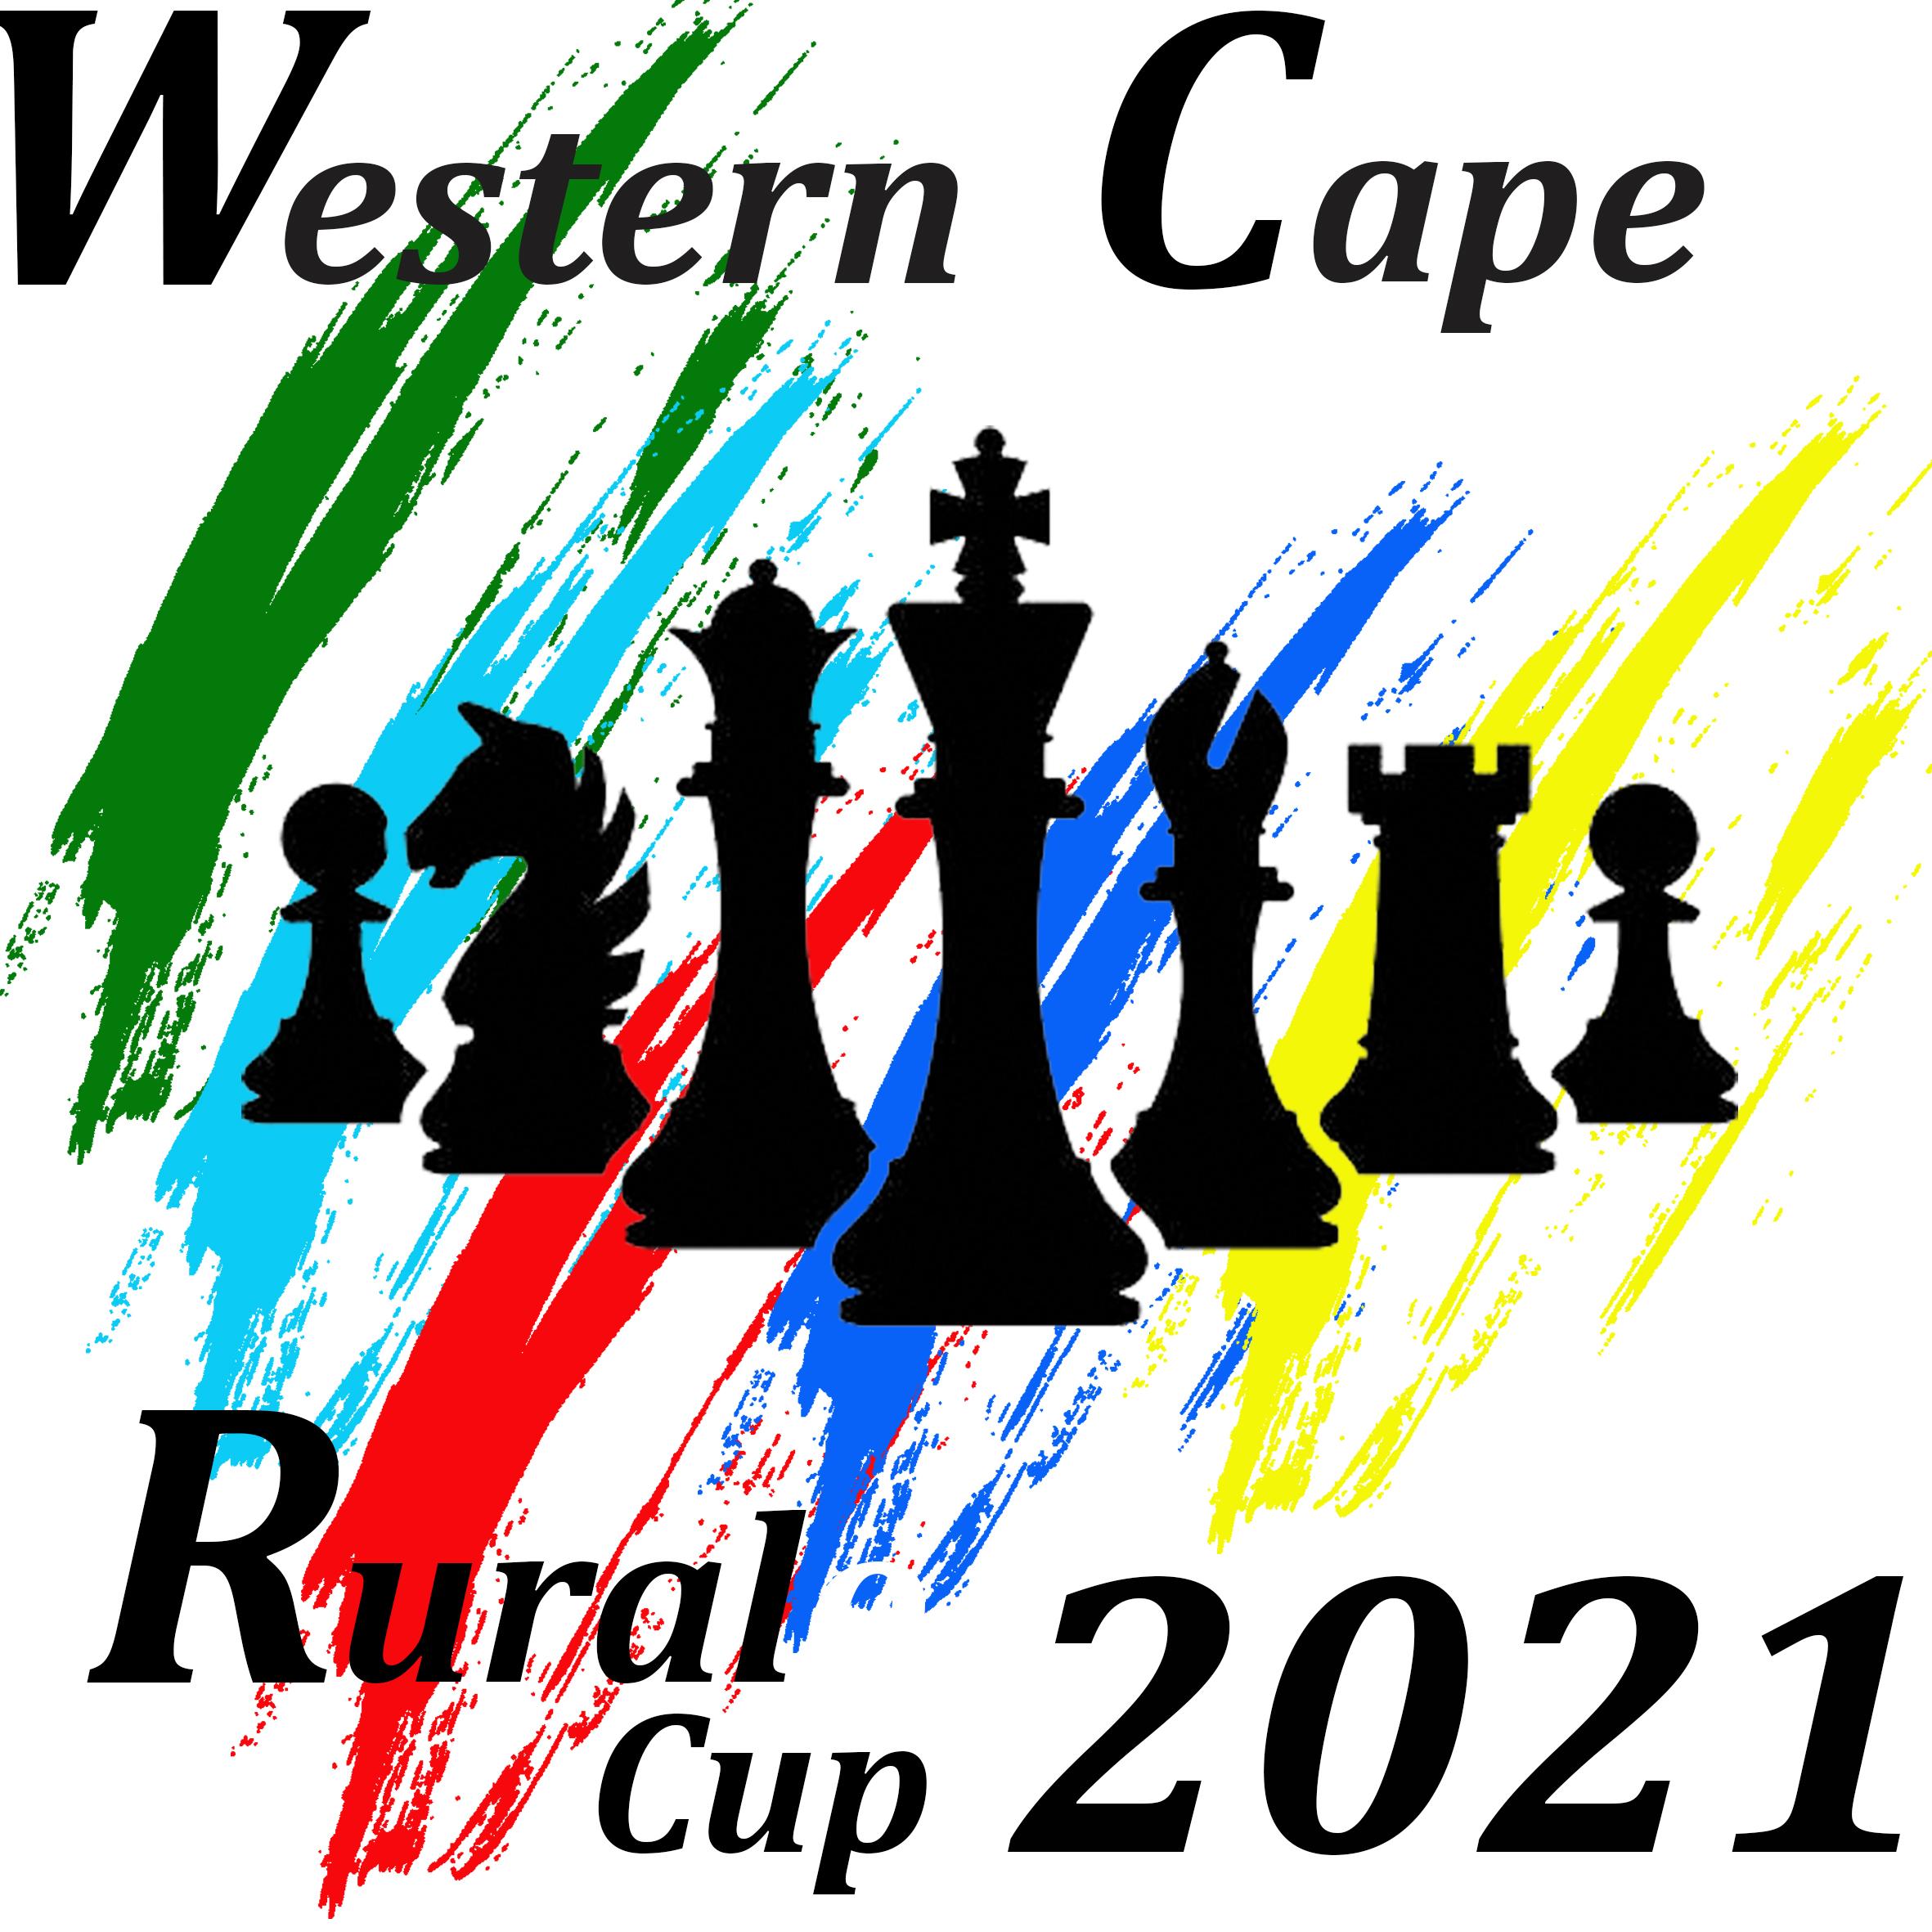 Western Cape Rural Cup 2021